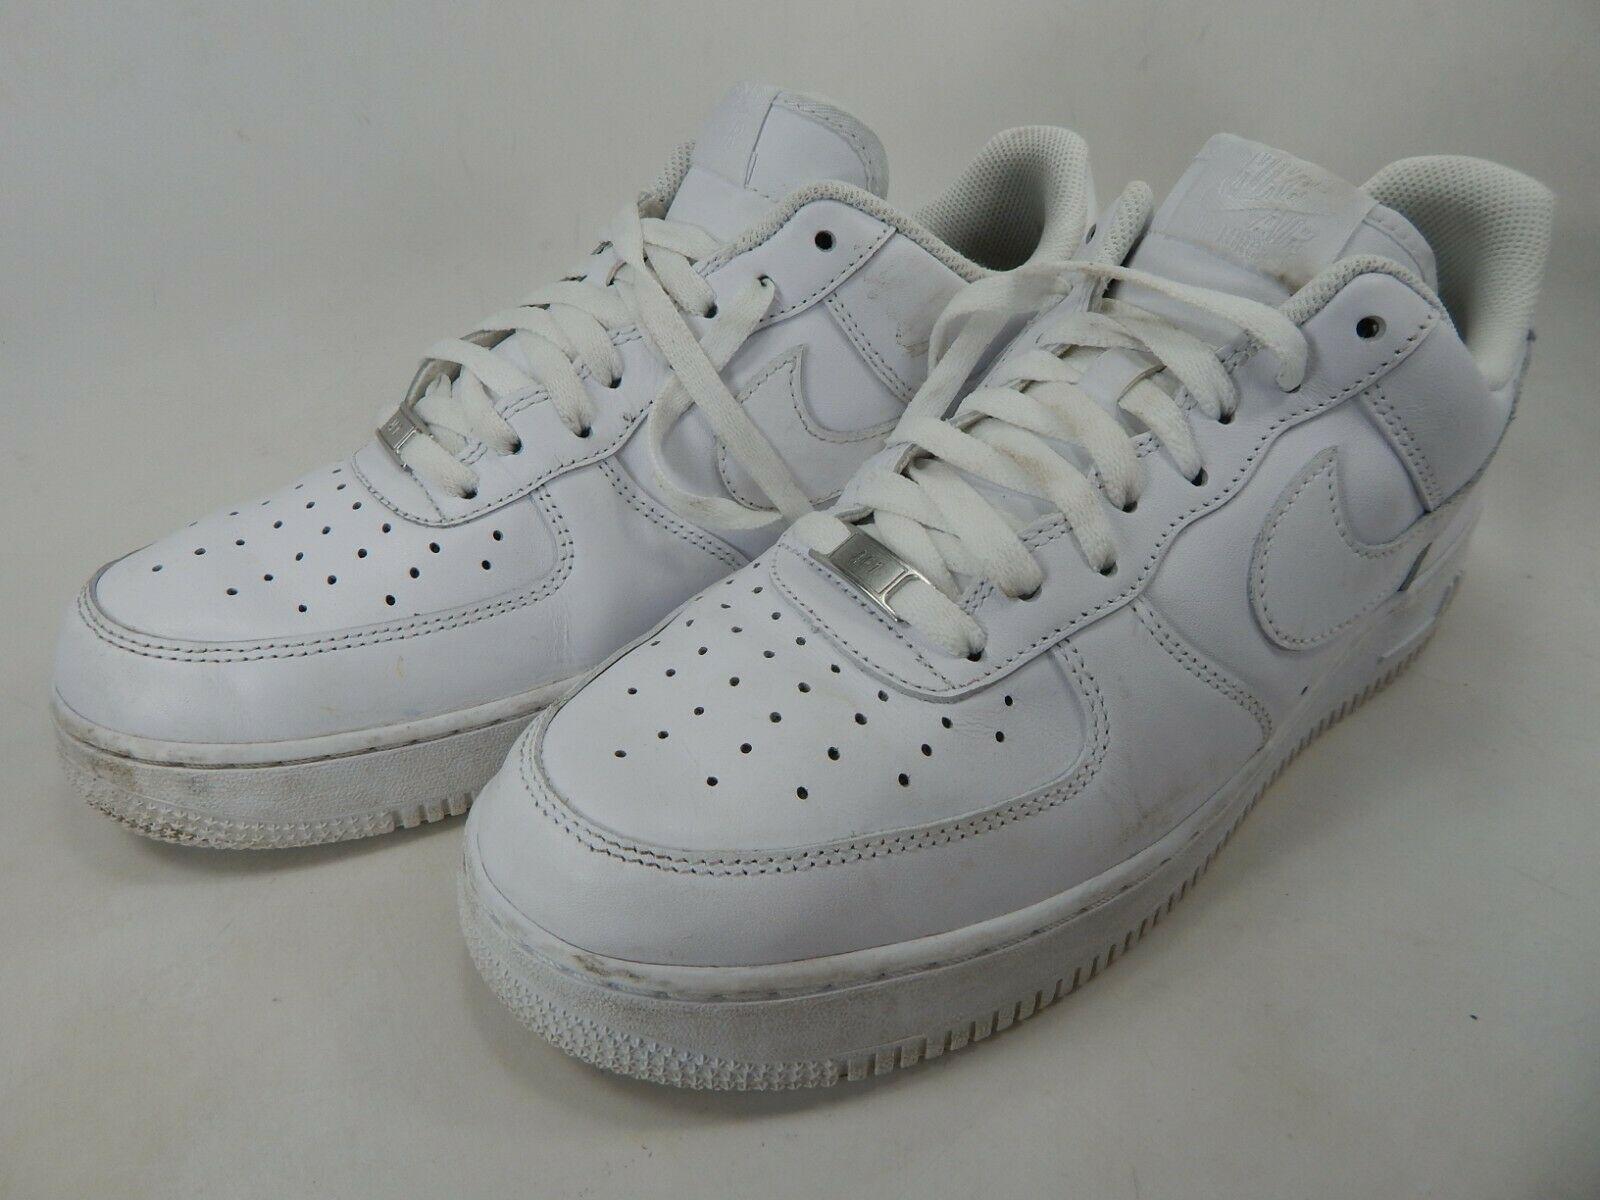 Nike Air Force 0.3m07 Größe 10.5 M (D) Eu 44,5 Herren Turnschuhe 315122-111